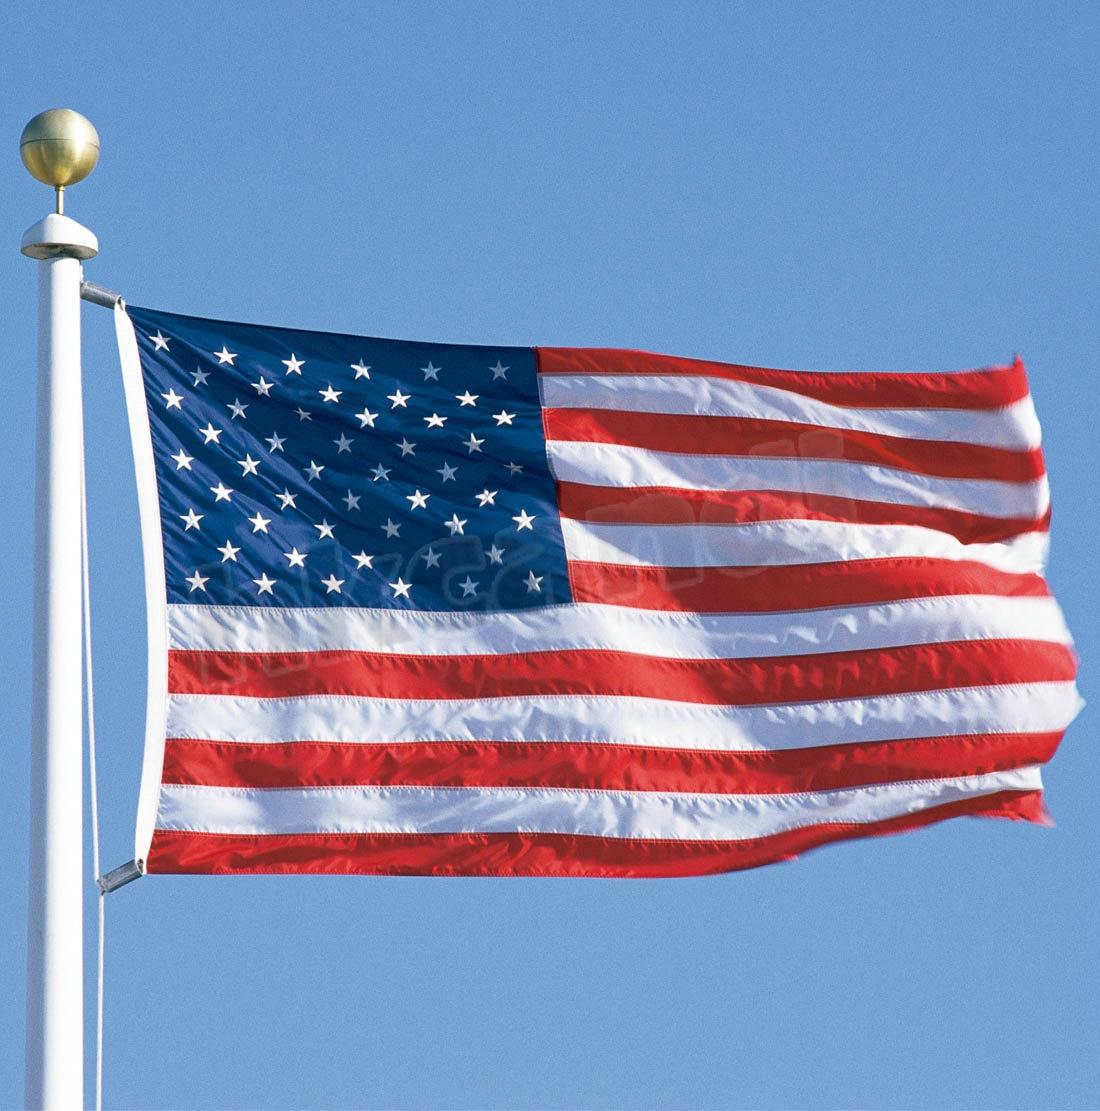 aliexpress com buy united kingdom national flag great british